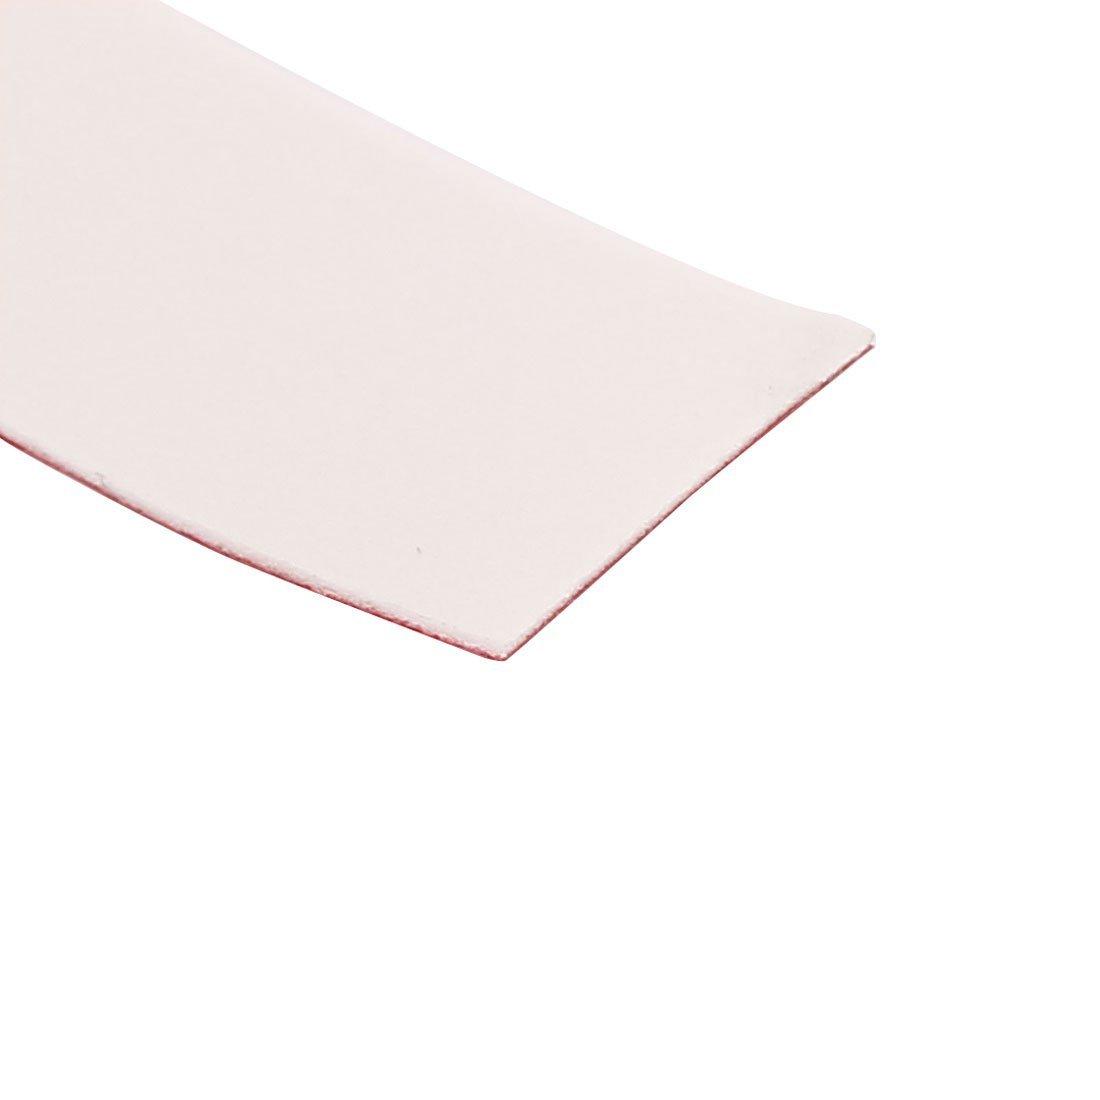 eDealMax 2pcs 25mm x 1mm Blanca Doble cara auto-adhesivo de espuma de la esponja de Cinta DE 10 millones de coches Longitud: Amazon.com: Industrial & ...